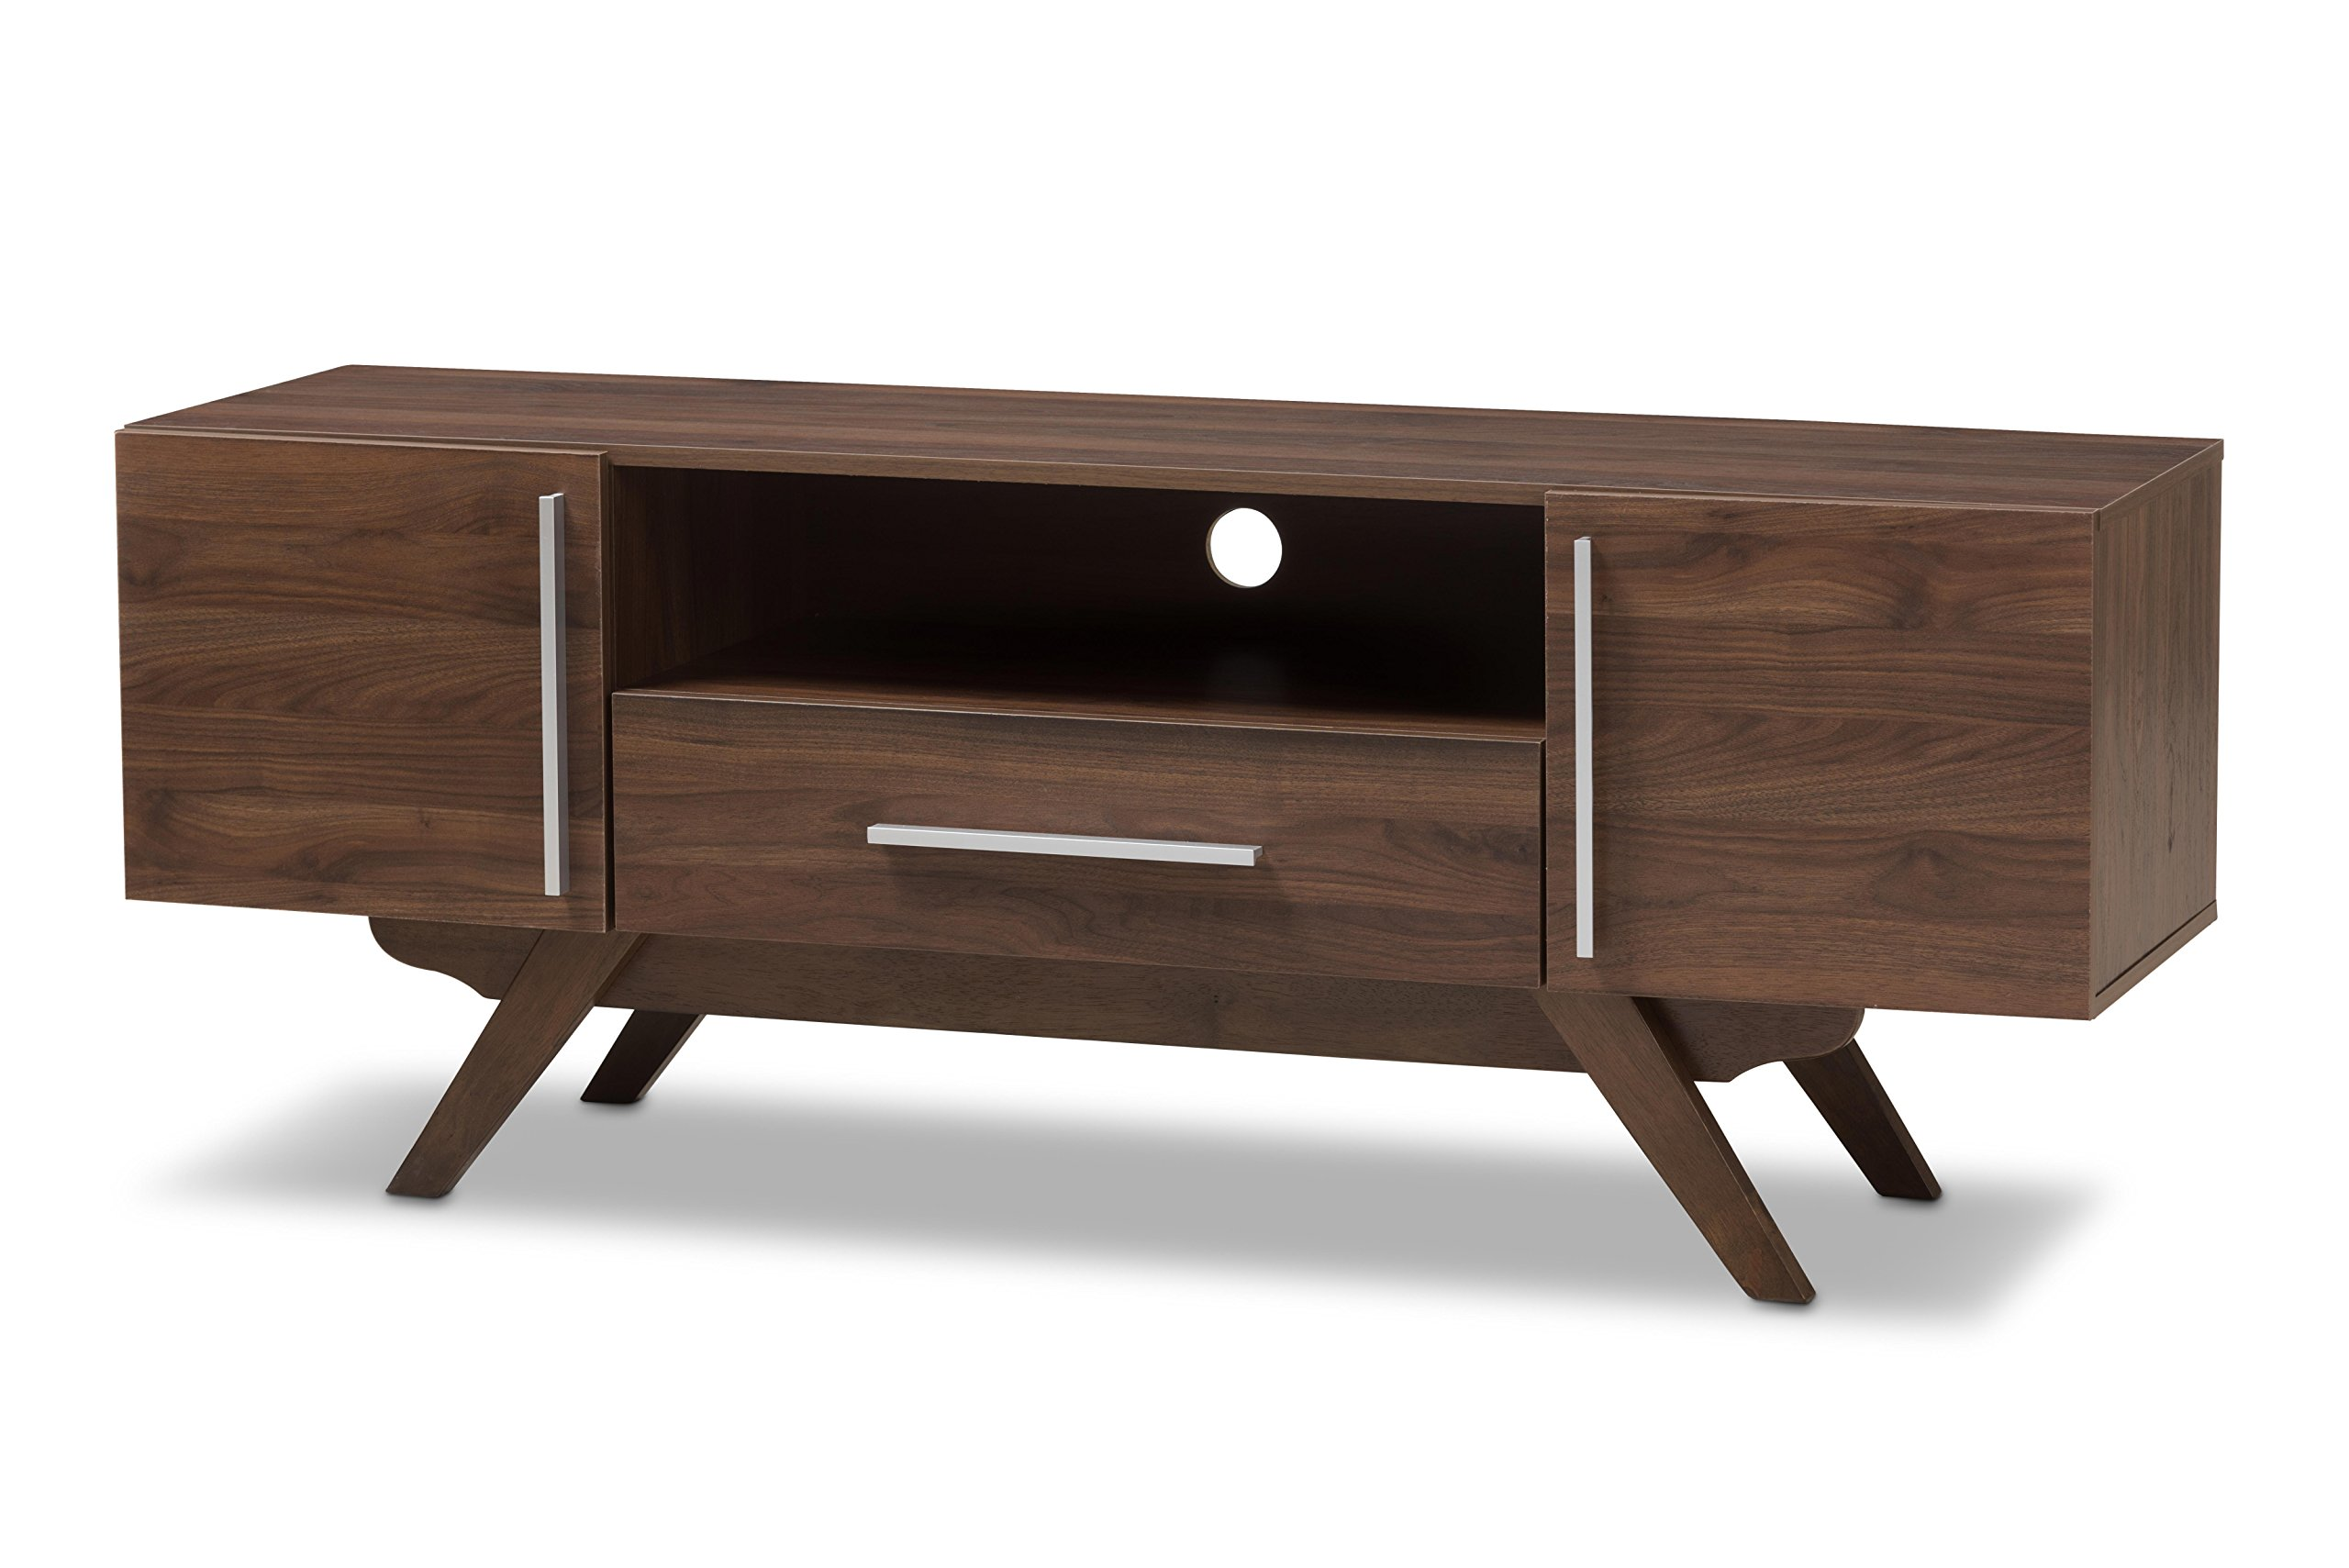 Baxton Studio Aulden Mid-Century Modern Walnut Brown Finished Wood TV Stand by Baxton Studio